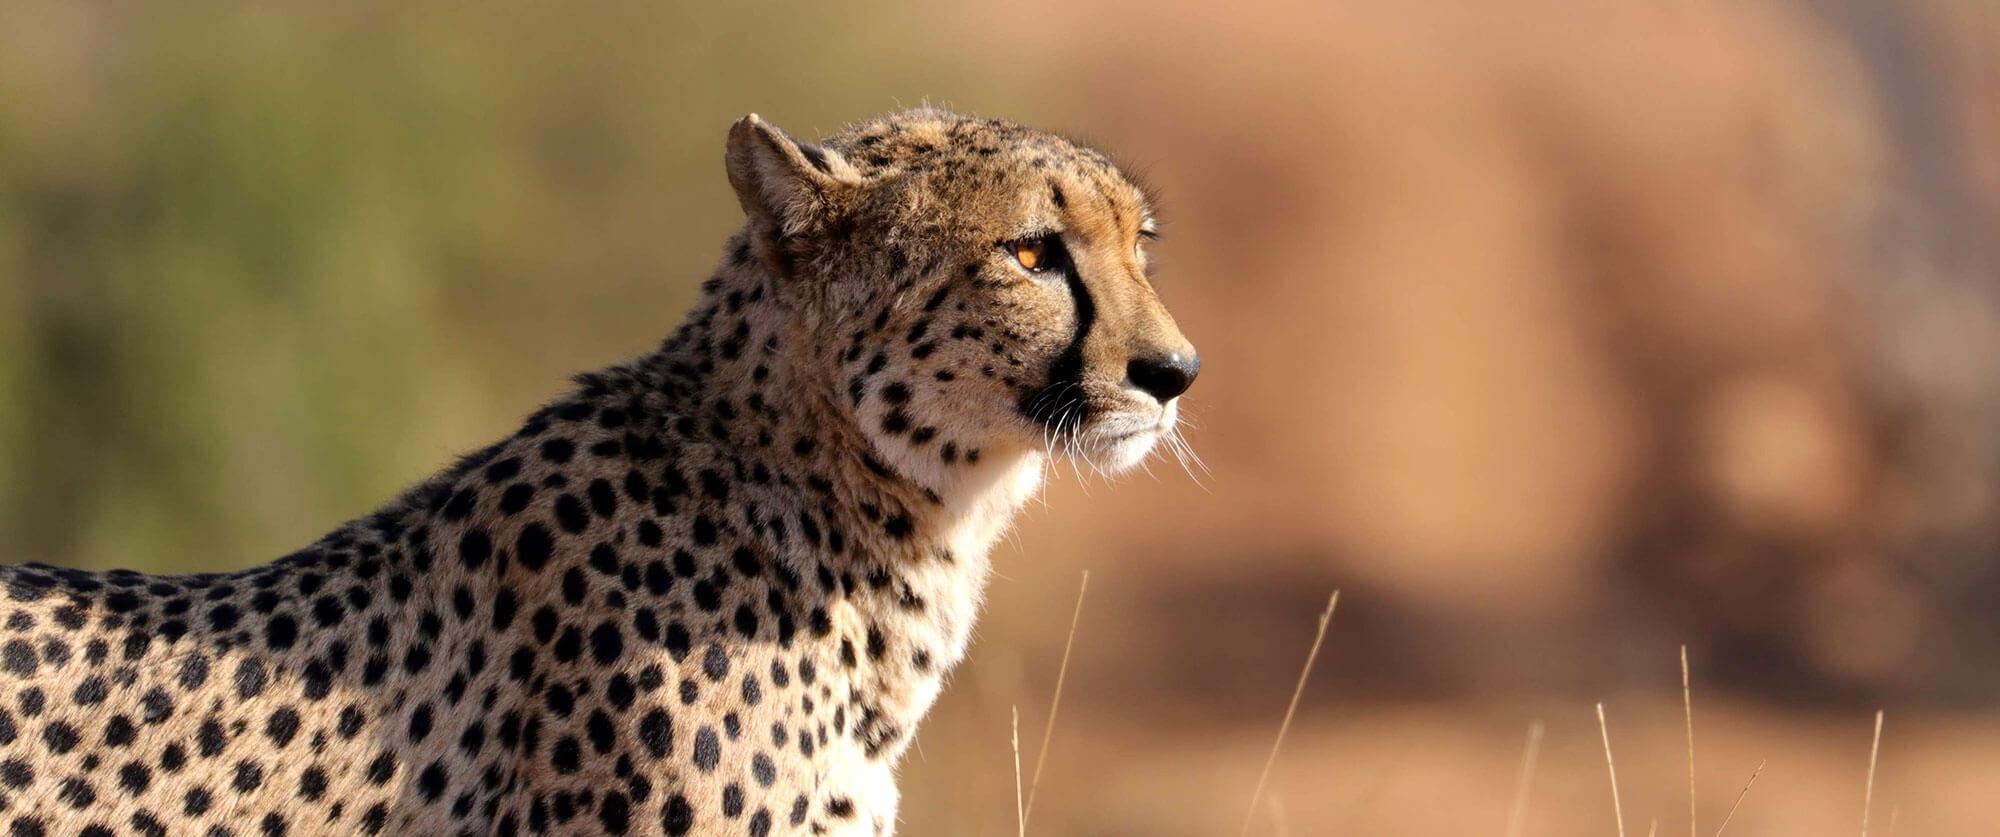 Cheetah on Safari at Garonga Safari Camp - Kruger Safari, City, and Winelands Vacation